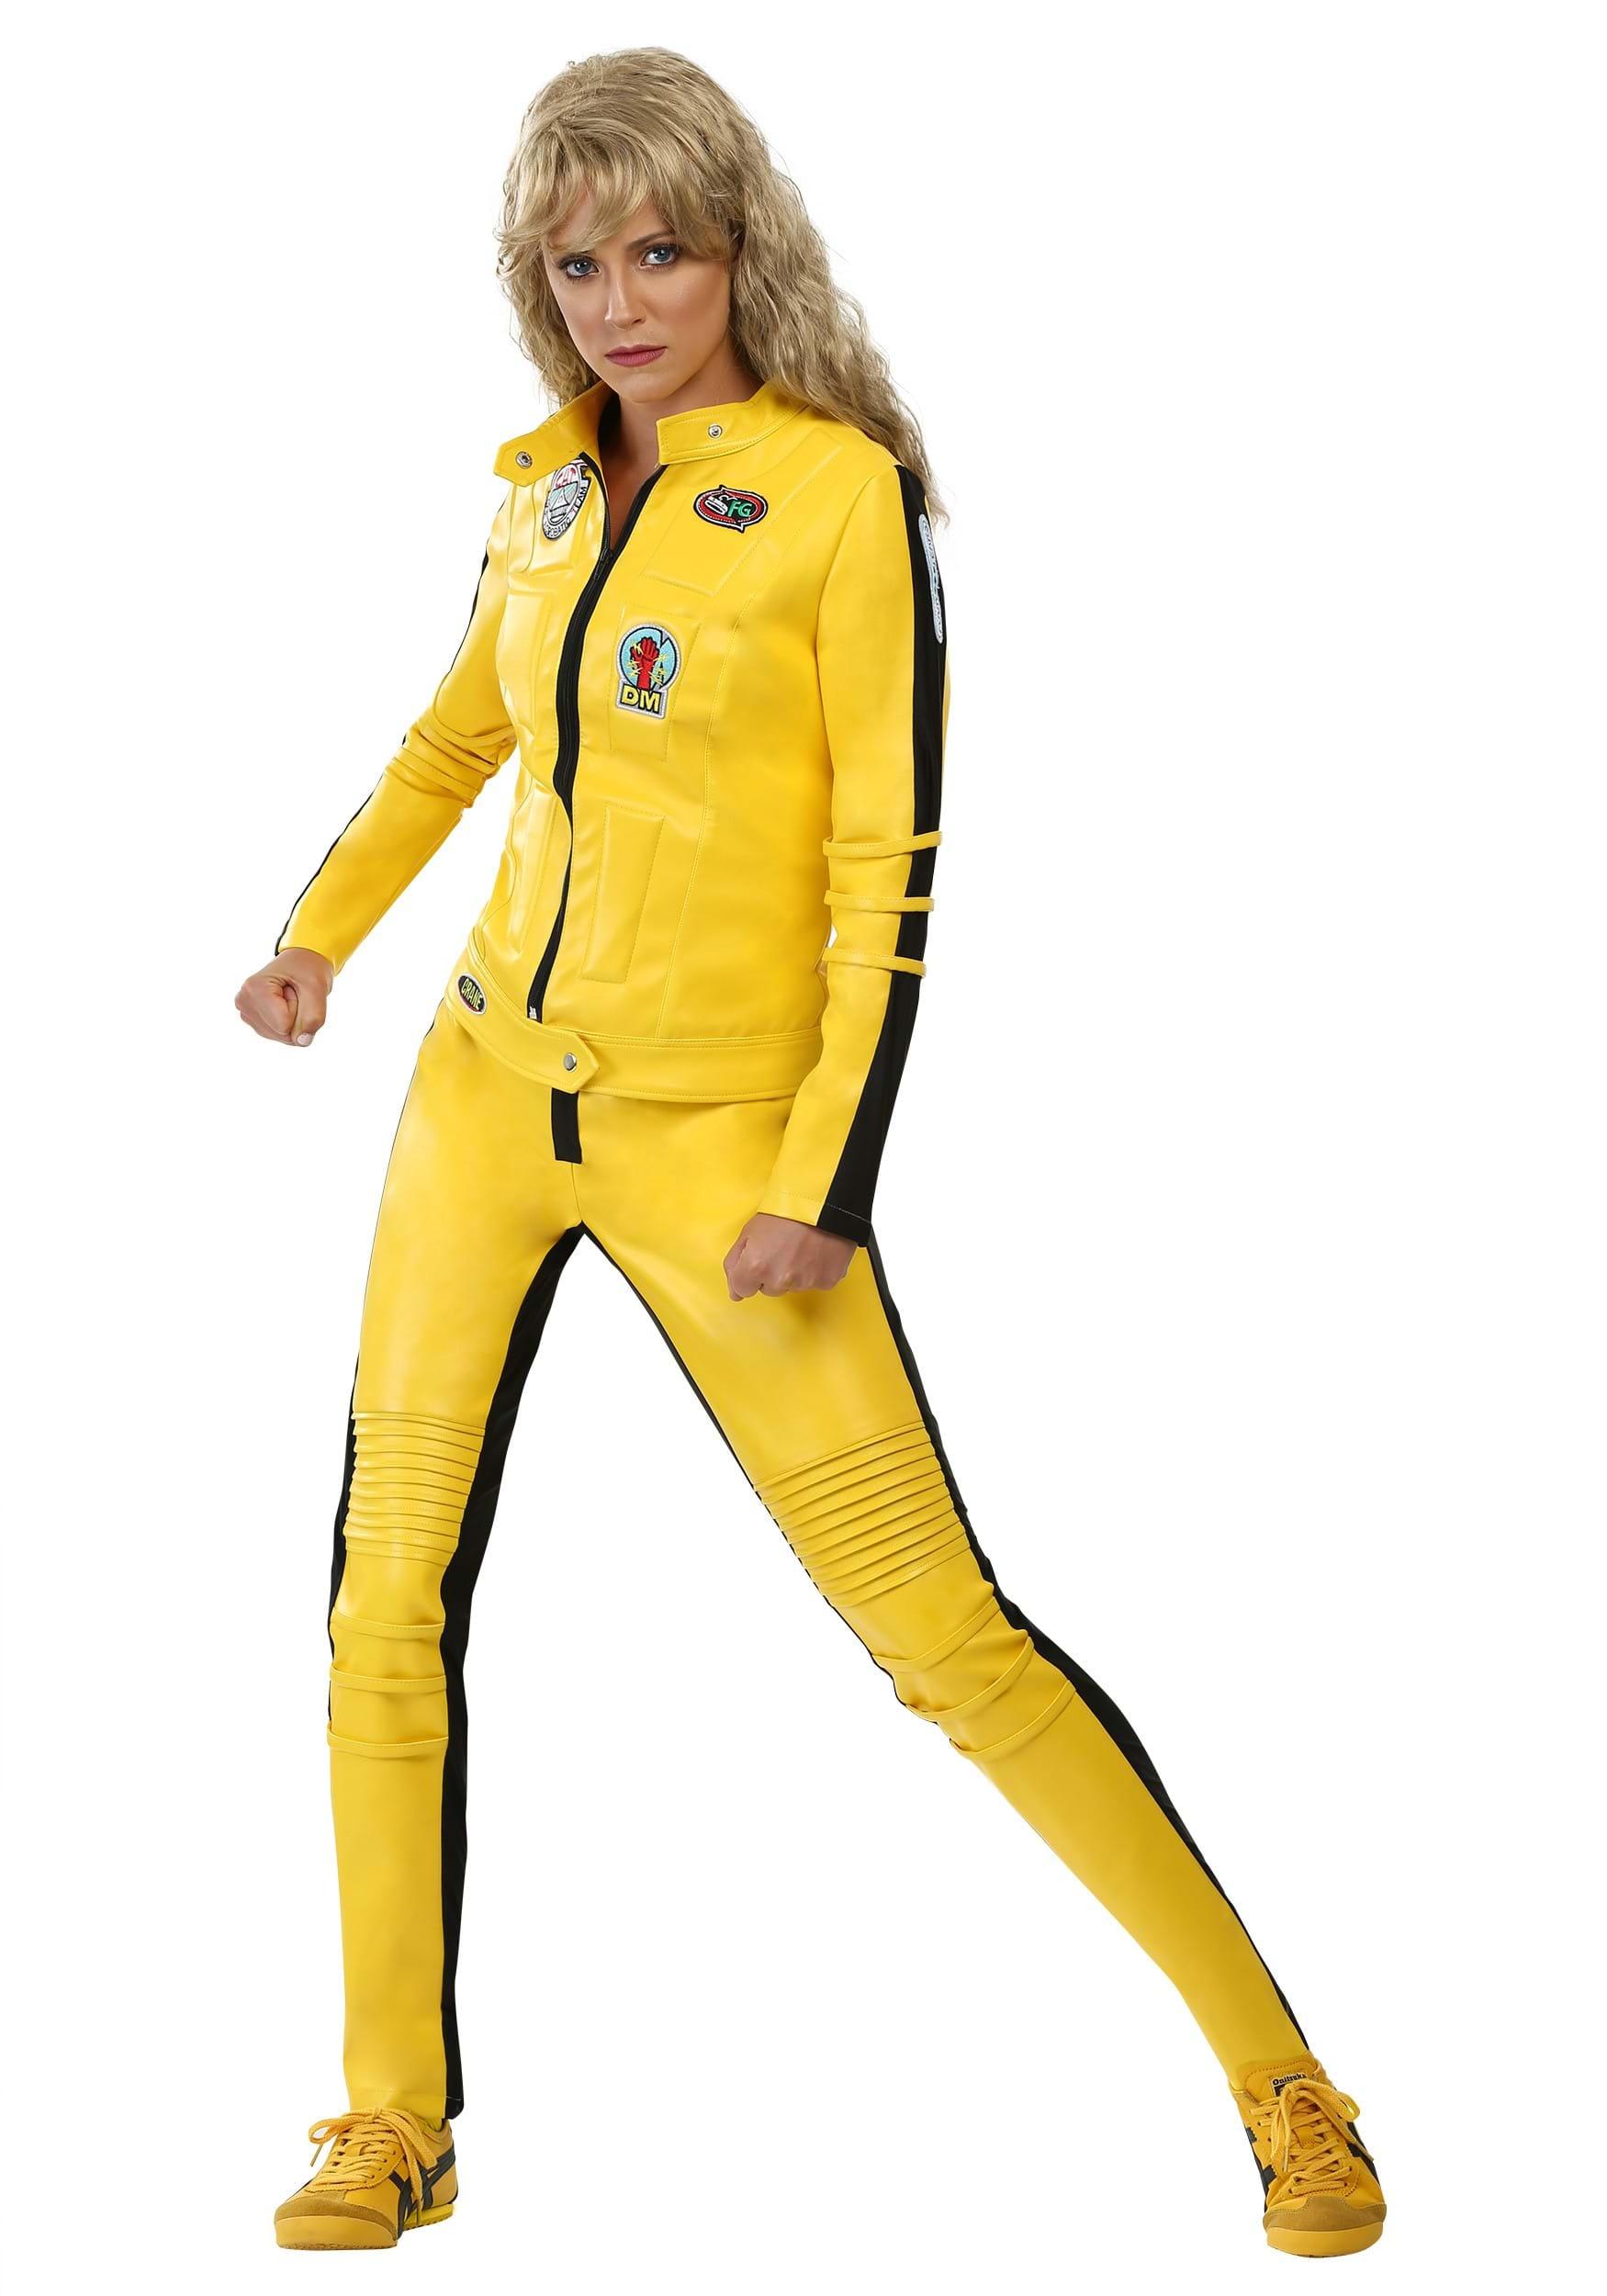 Beatrix Kiddo Motorcycle Suit Costume FUN0206AD